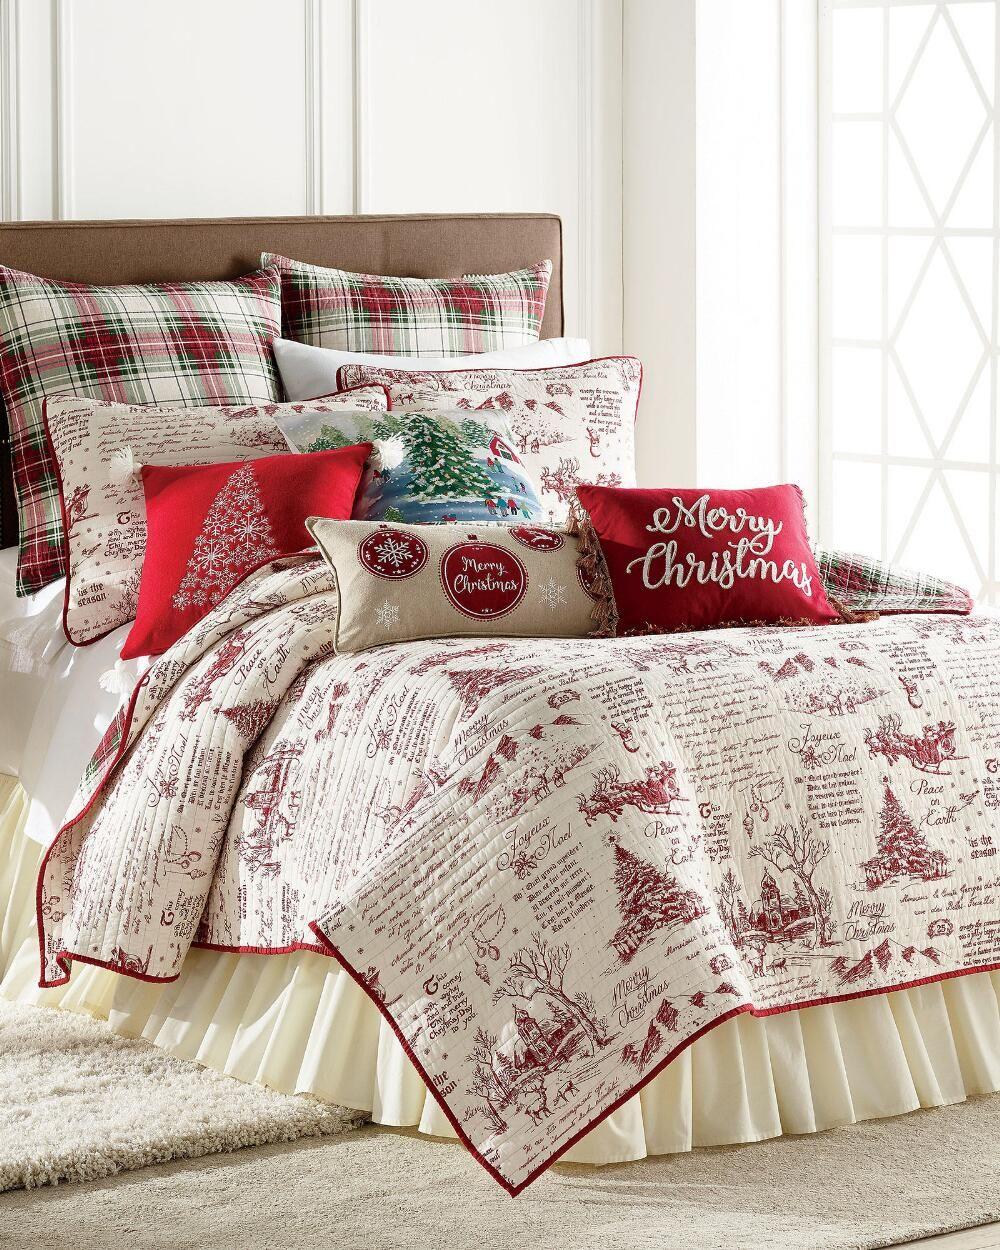 Joyeux Noel Boucle Knit Decorative Pillow Christmas Bedroom